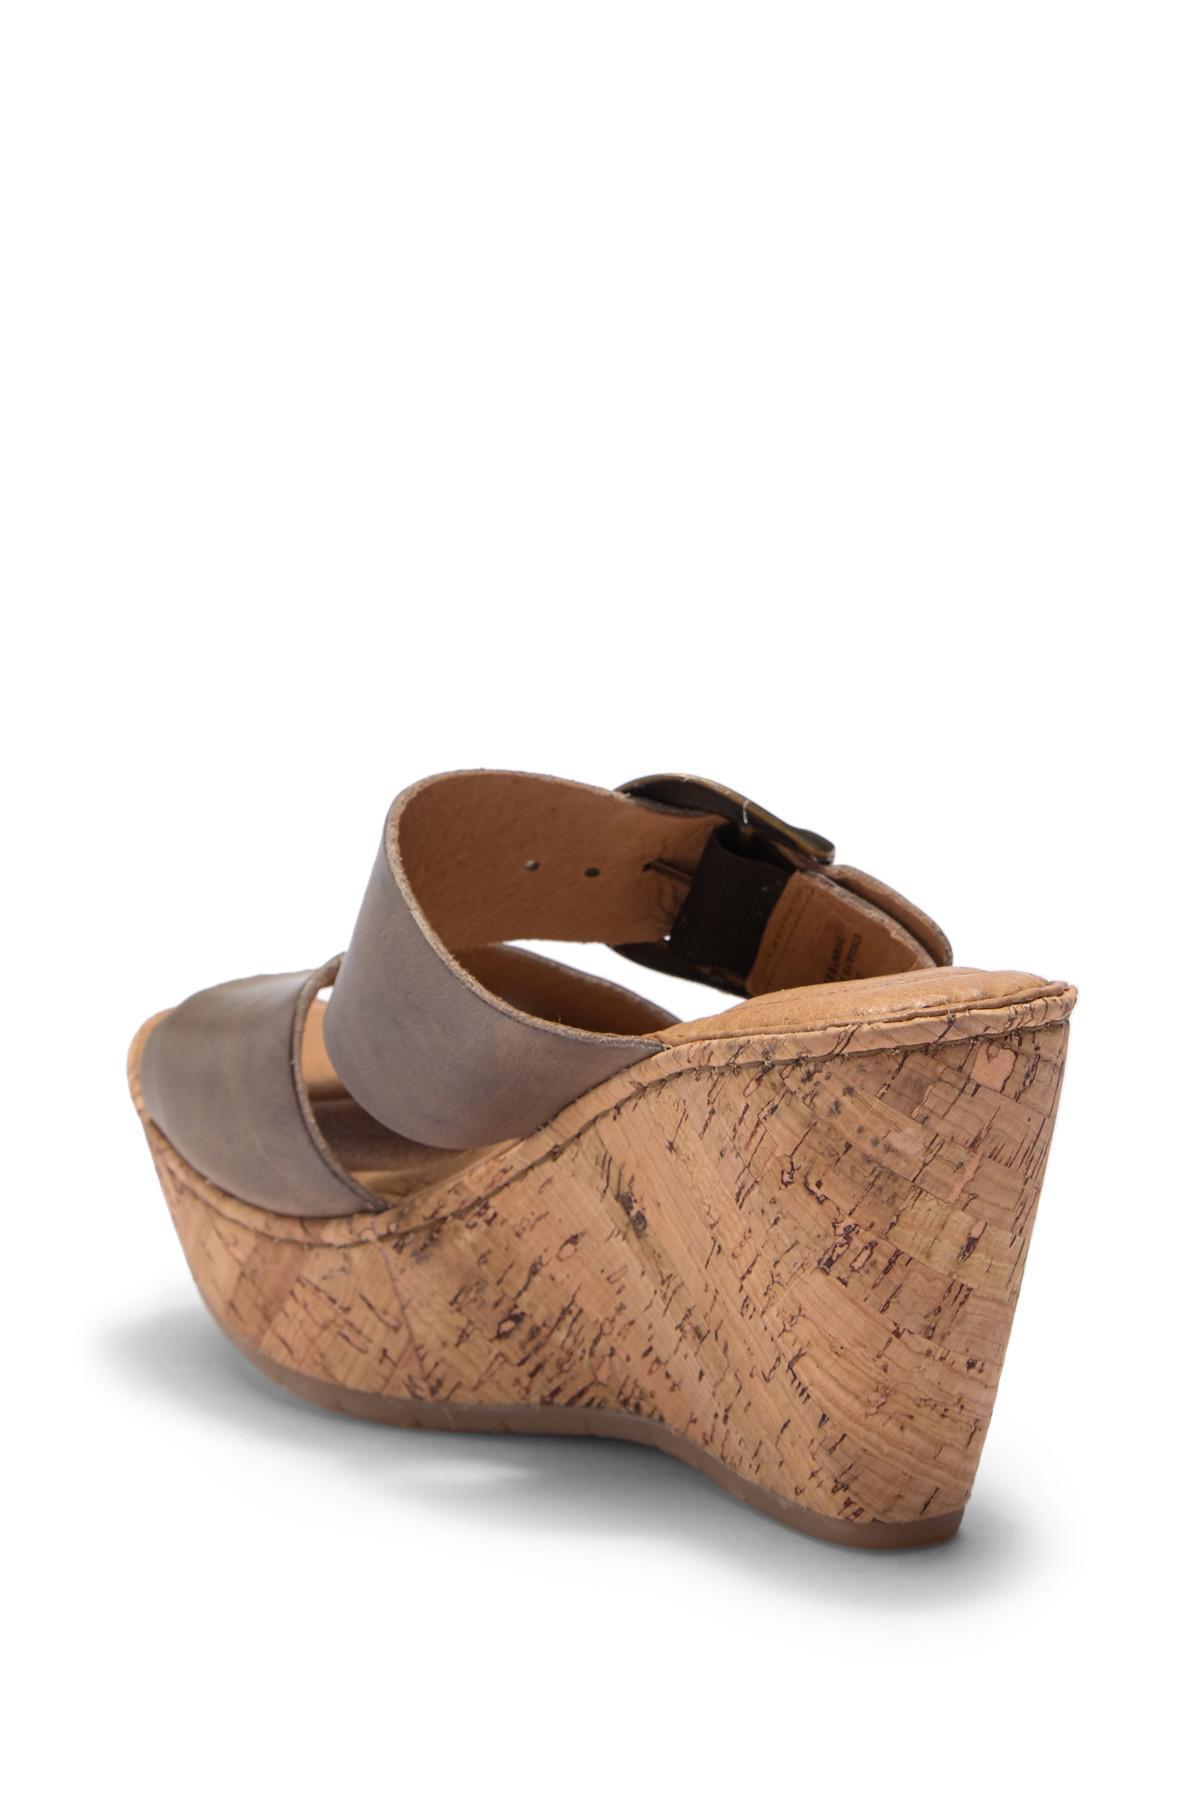 22d5d1fd1e3 Lyst - Born Emmy Band Platform Wedge Sandal in Brown